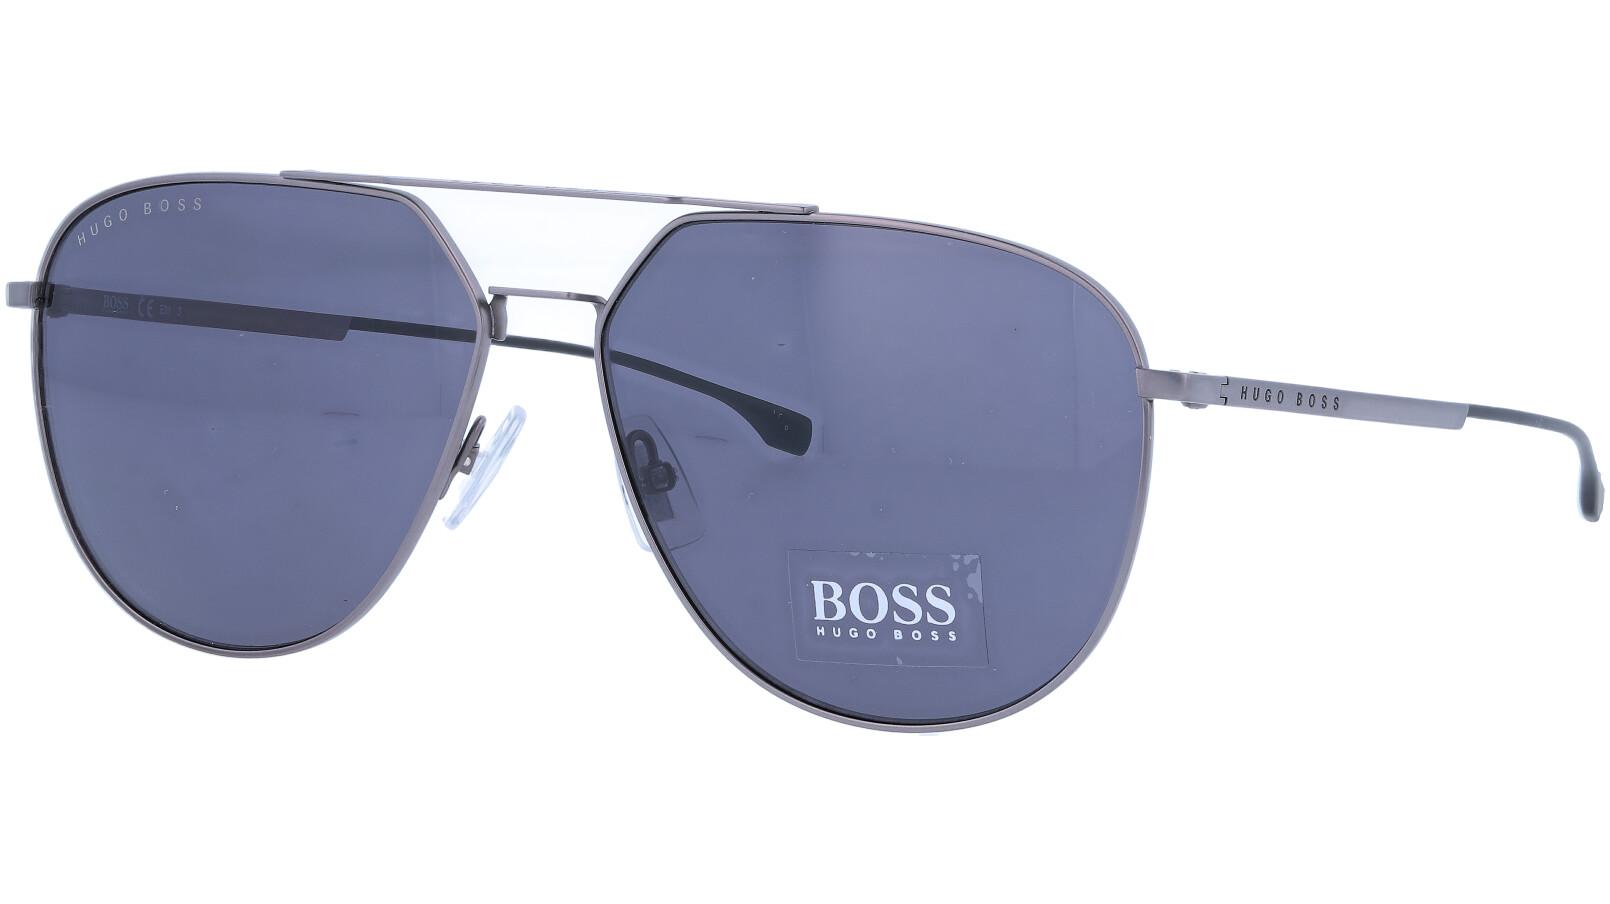 HUGO BOSS BOSS0994FS WCNIR 63 SMTGREY Sunglasses